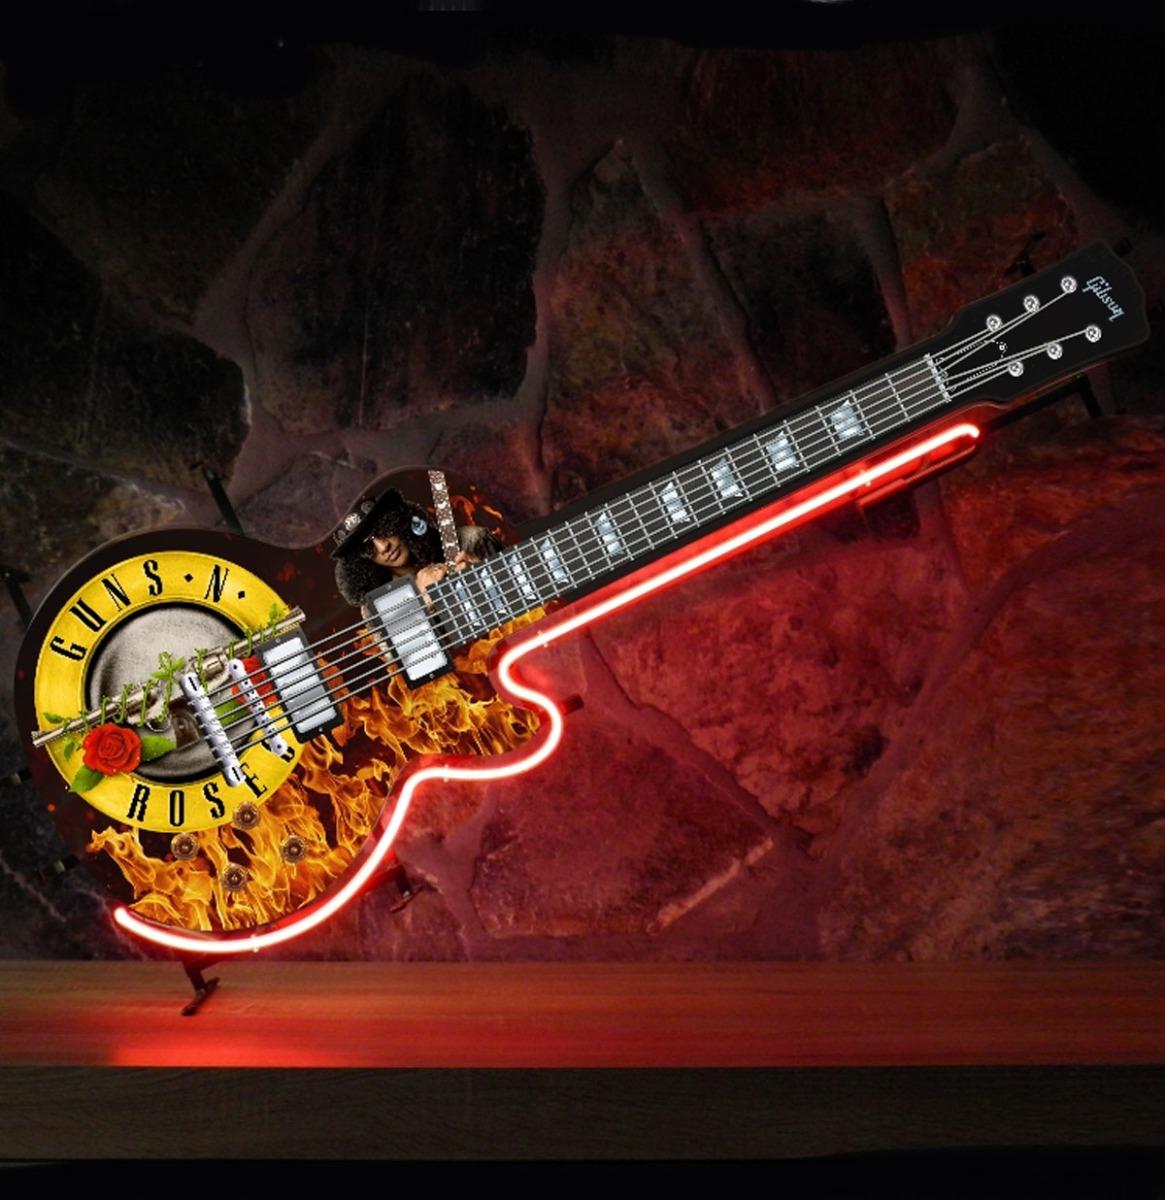 Guns 'N' Roses Gibson Gitaar Neon Verlichting 119 x 45 cm